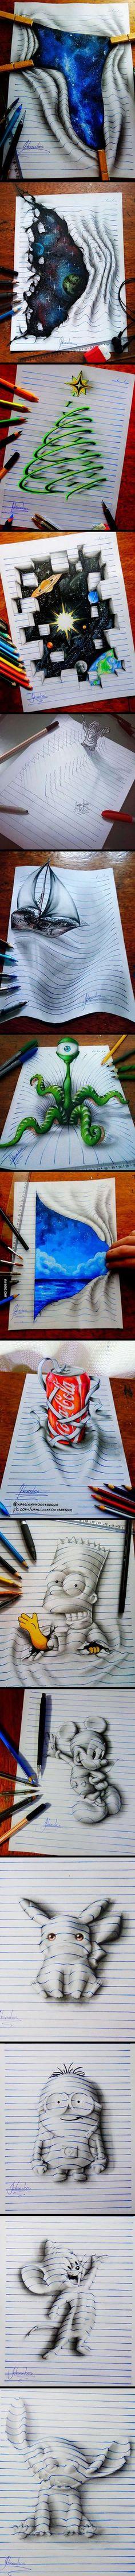 Artist João Carvalho Creates 3-D Doodles That Leap Off The Page - 9GAG